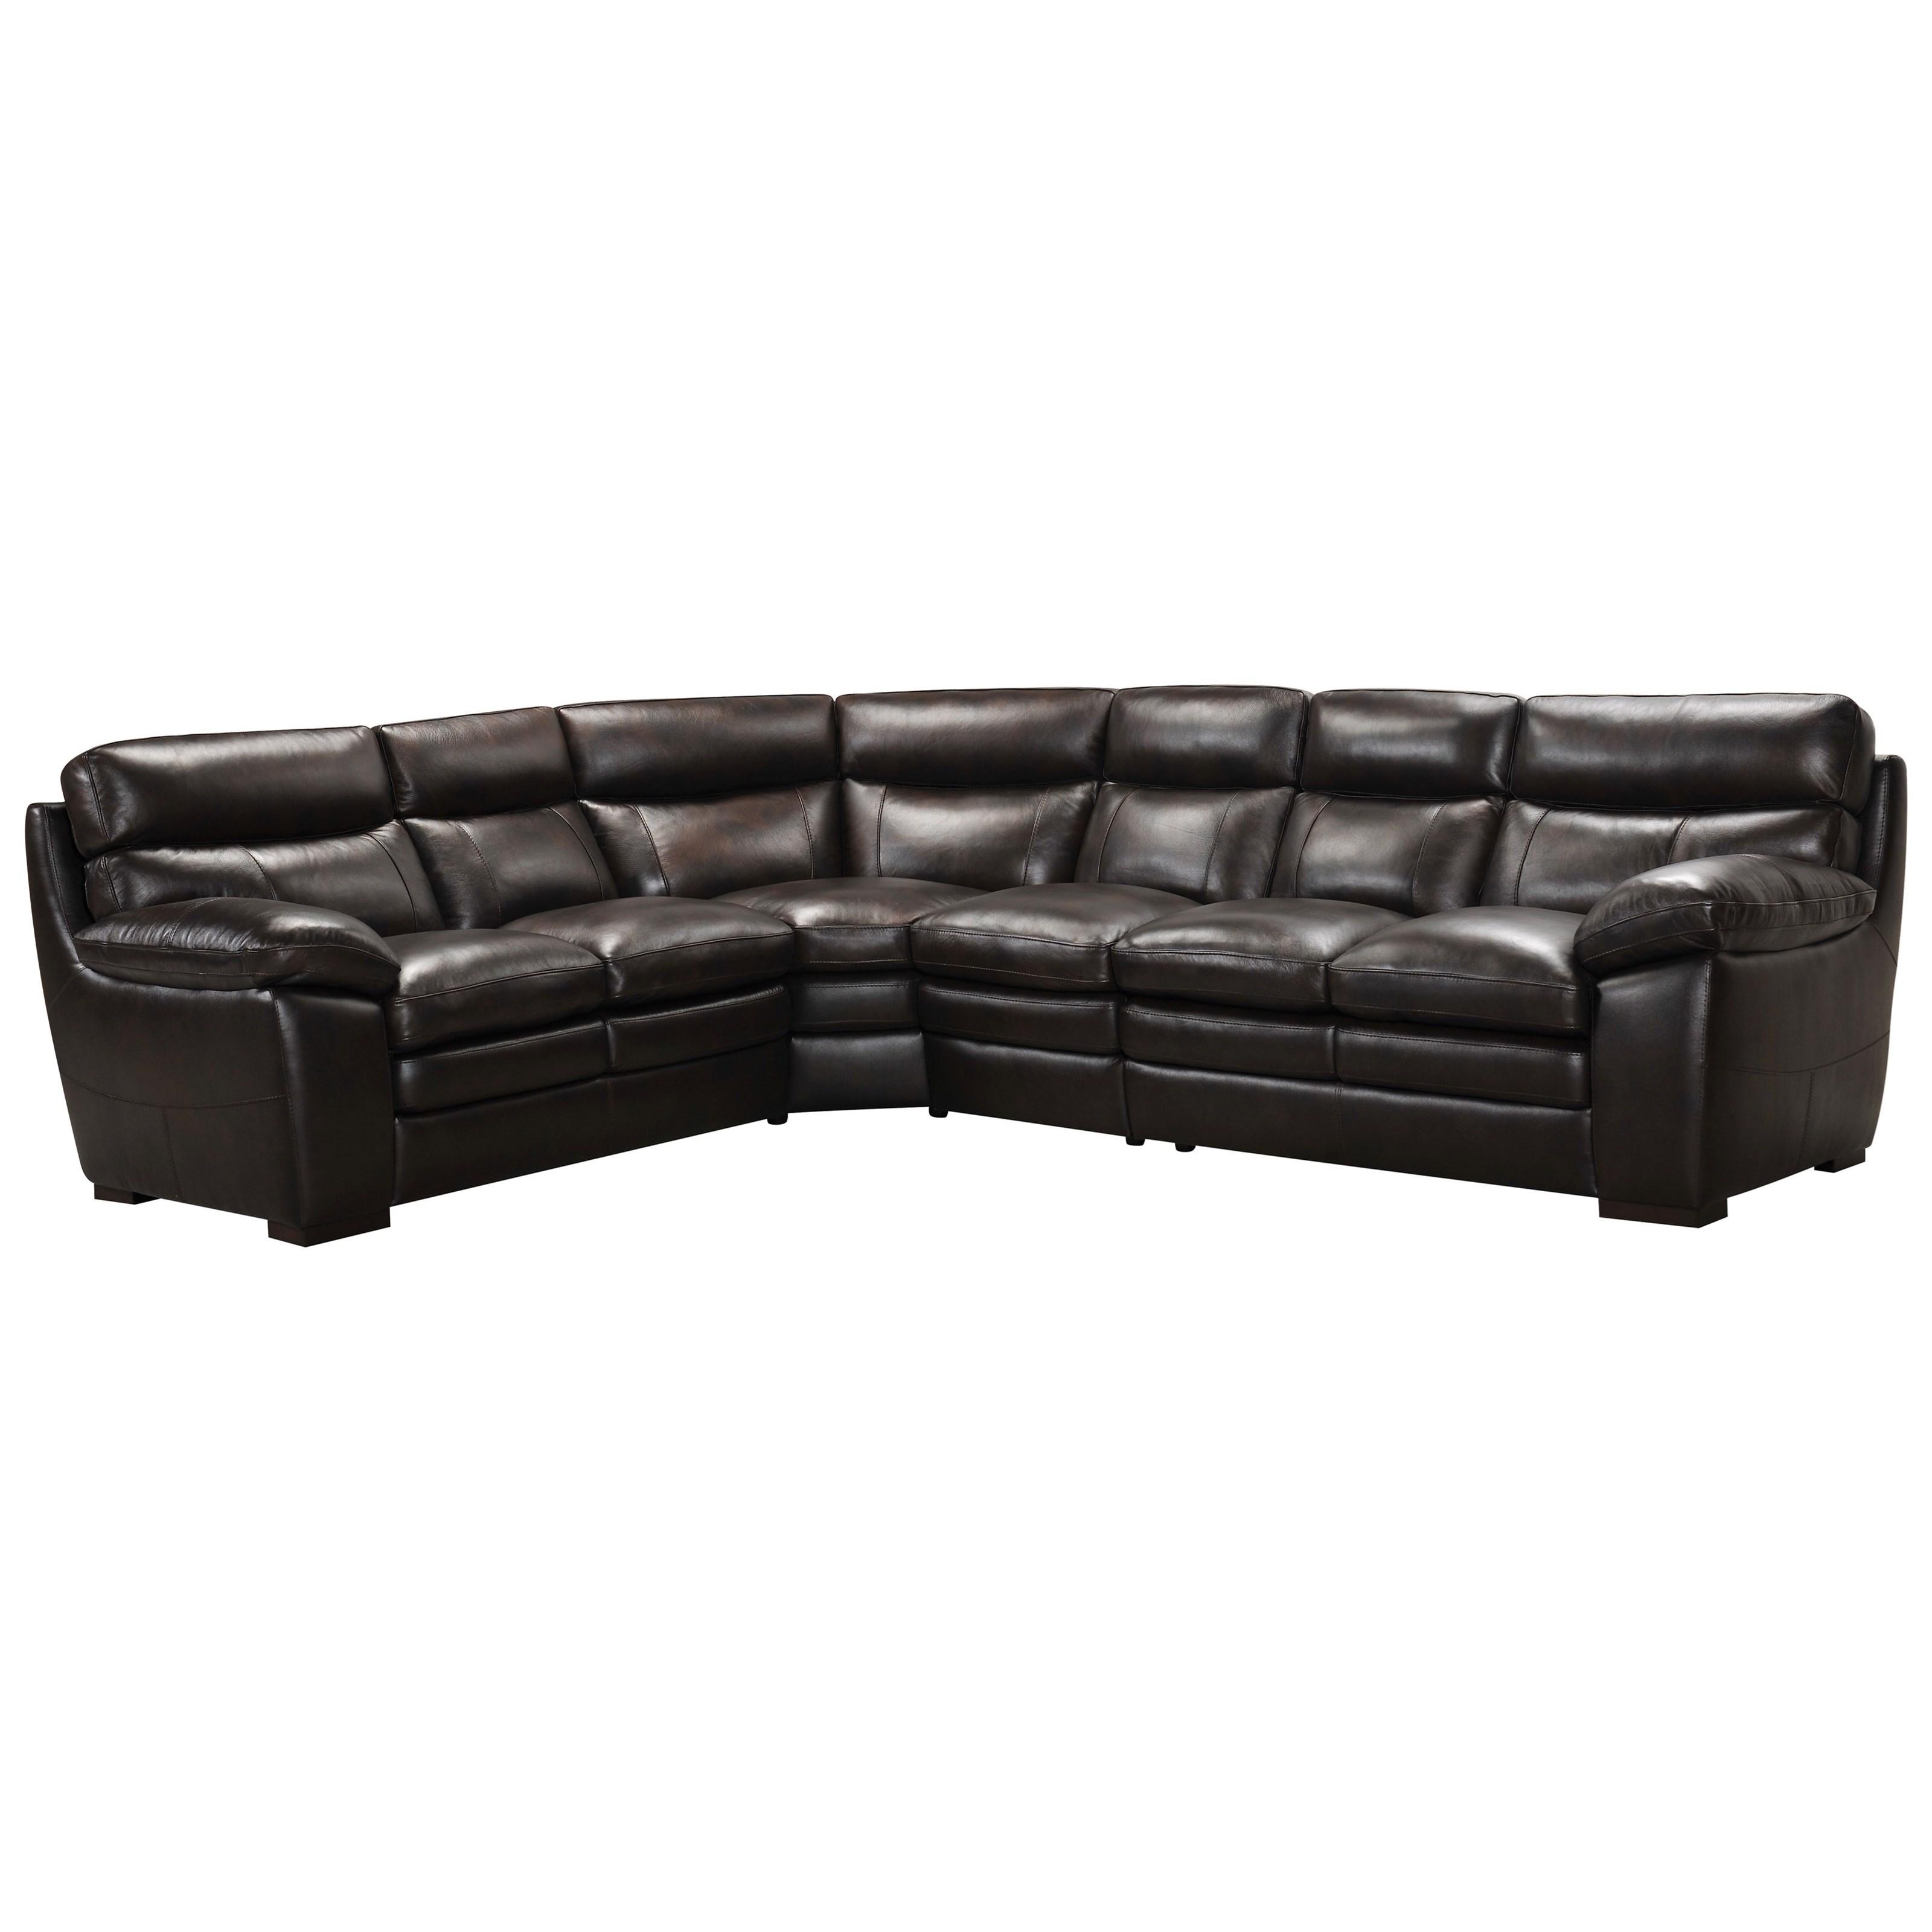 4-Pc Sectional Sofa